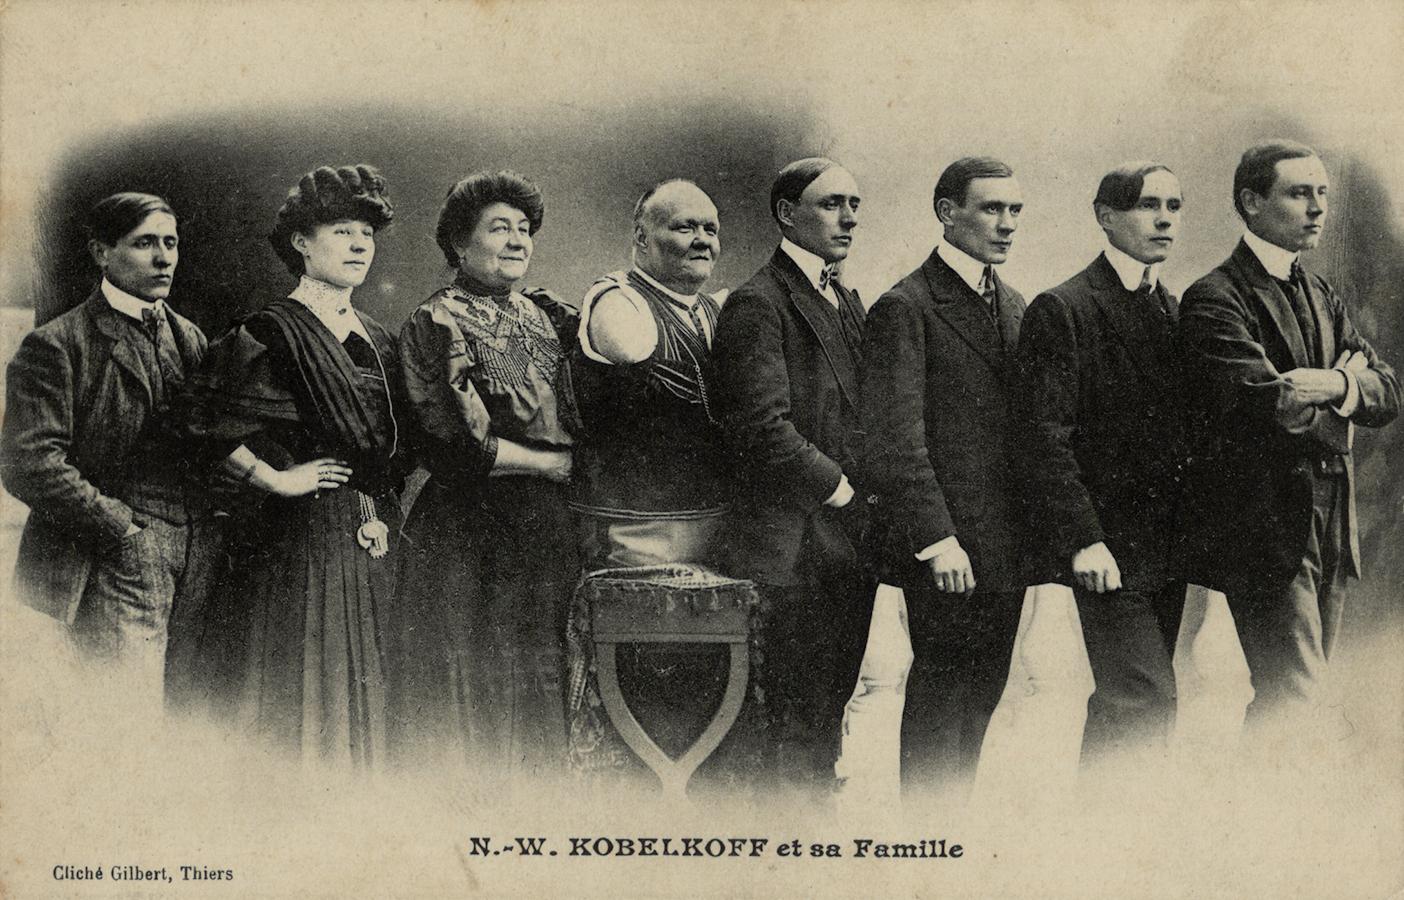 v.l.n.r.: Sohn Ernst, Tochter Helene, Ehefrau Anna, Nikolai Kobelkoff, Sohn Alexander, Sohn Otto, Sohn Paul und Sohn Nikolai